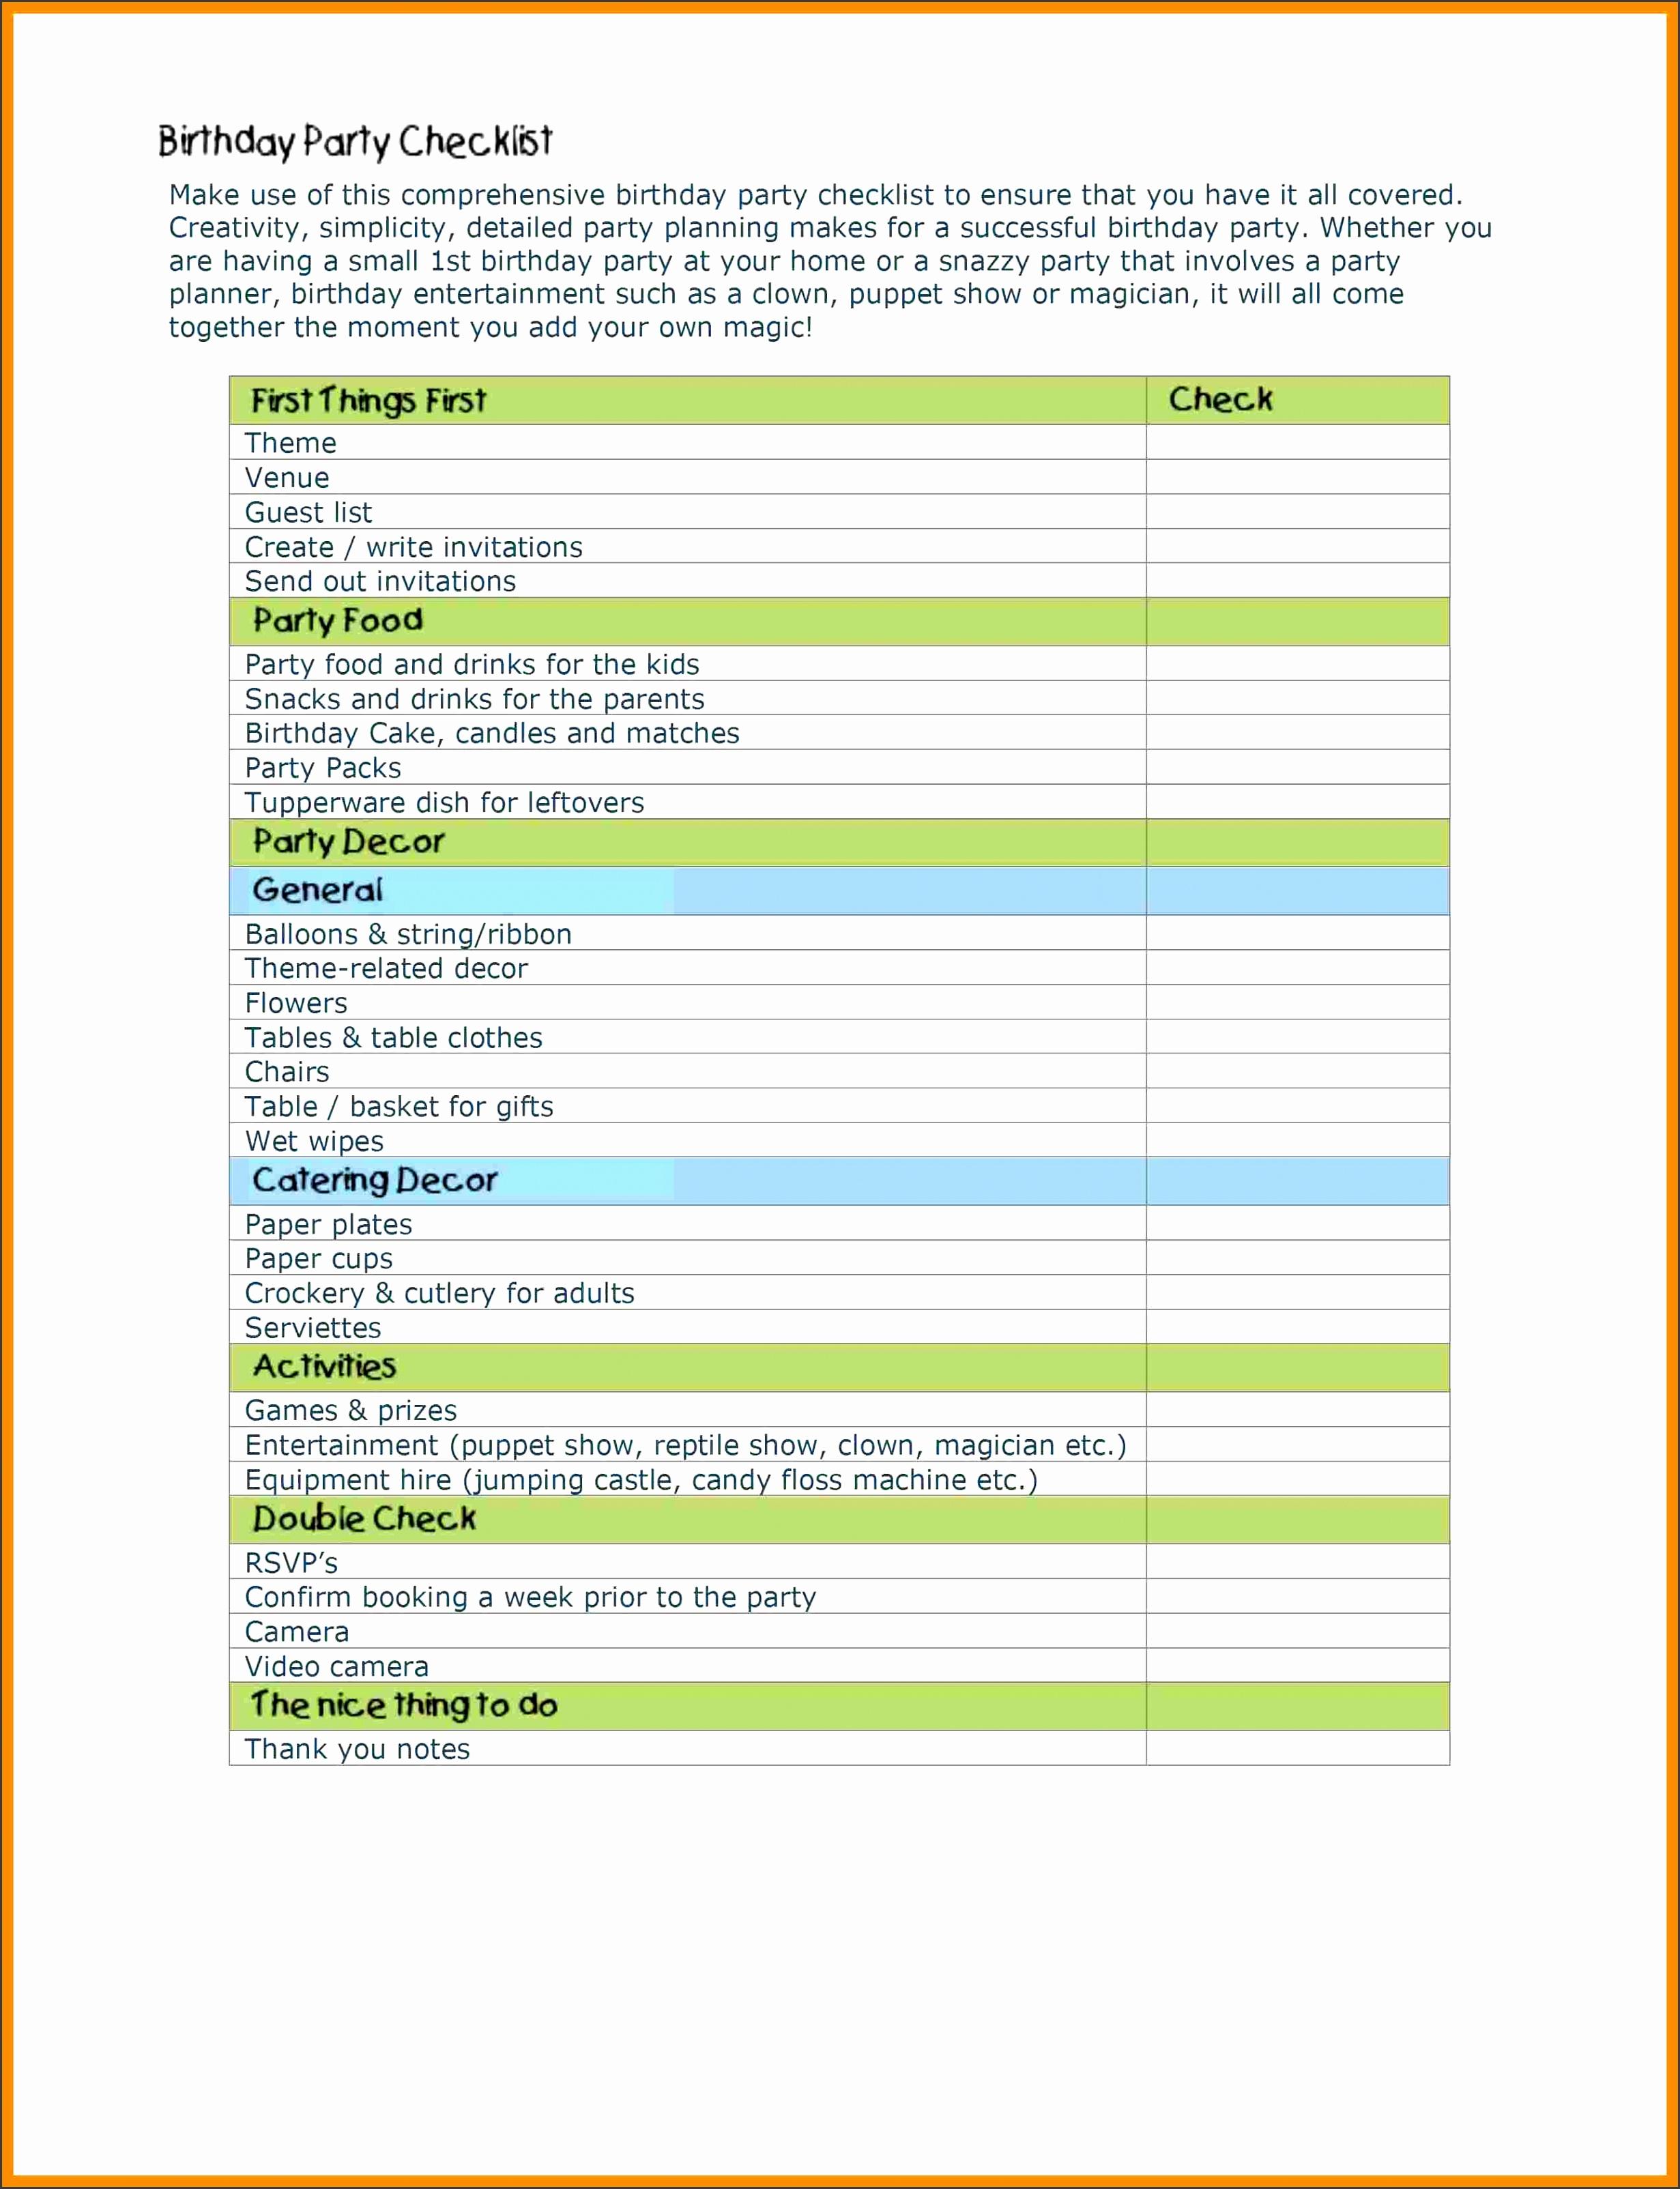 Free Templates Birthday Party Checklist Template Free Templates Birthday Party Checklist Template